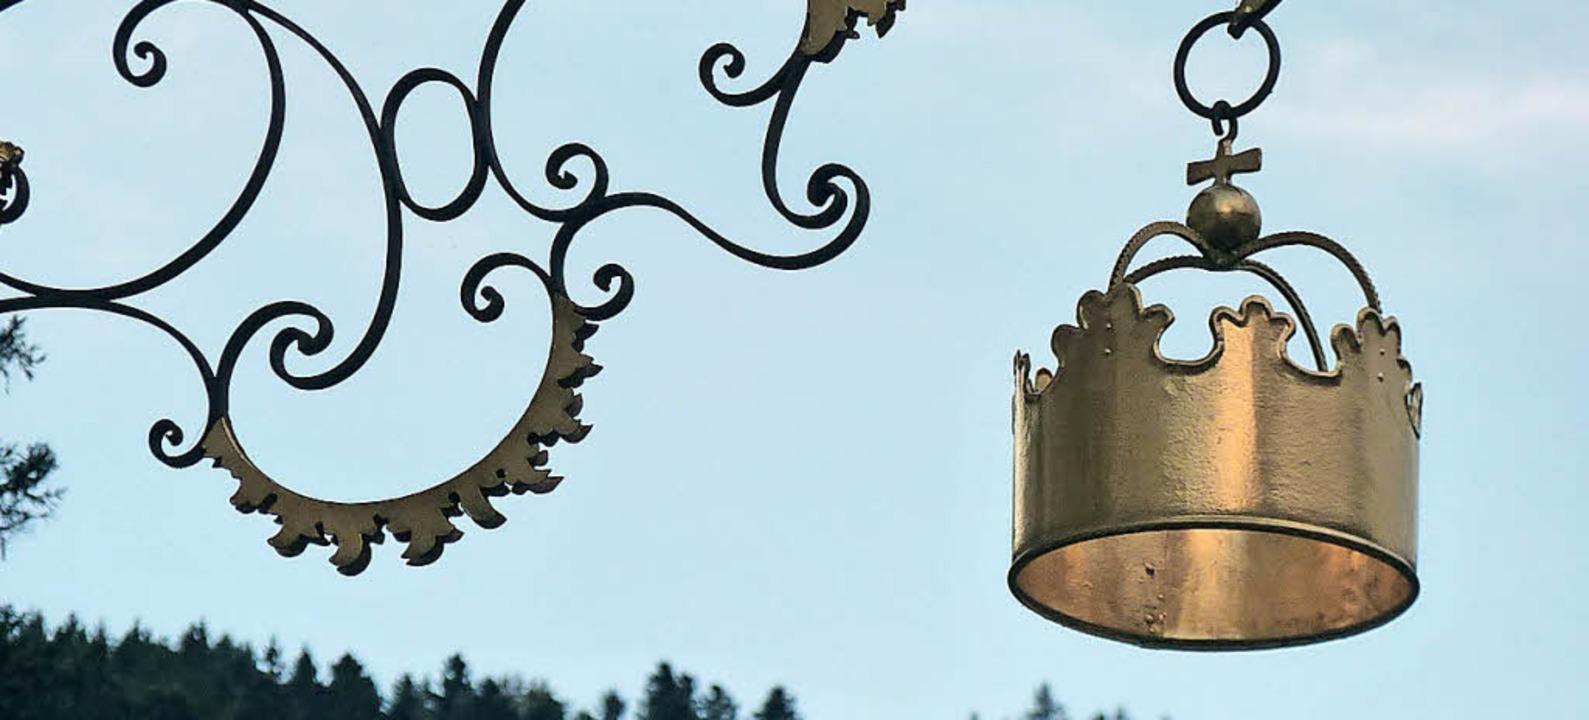 Das Wirtshausmuseum Krone in Tegernau  | Foto: dsa